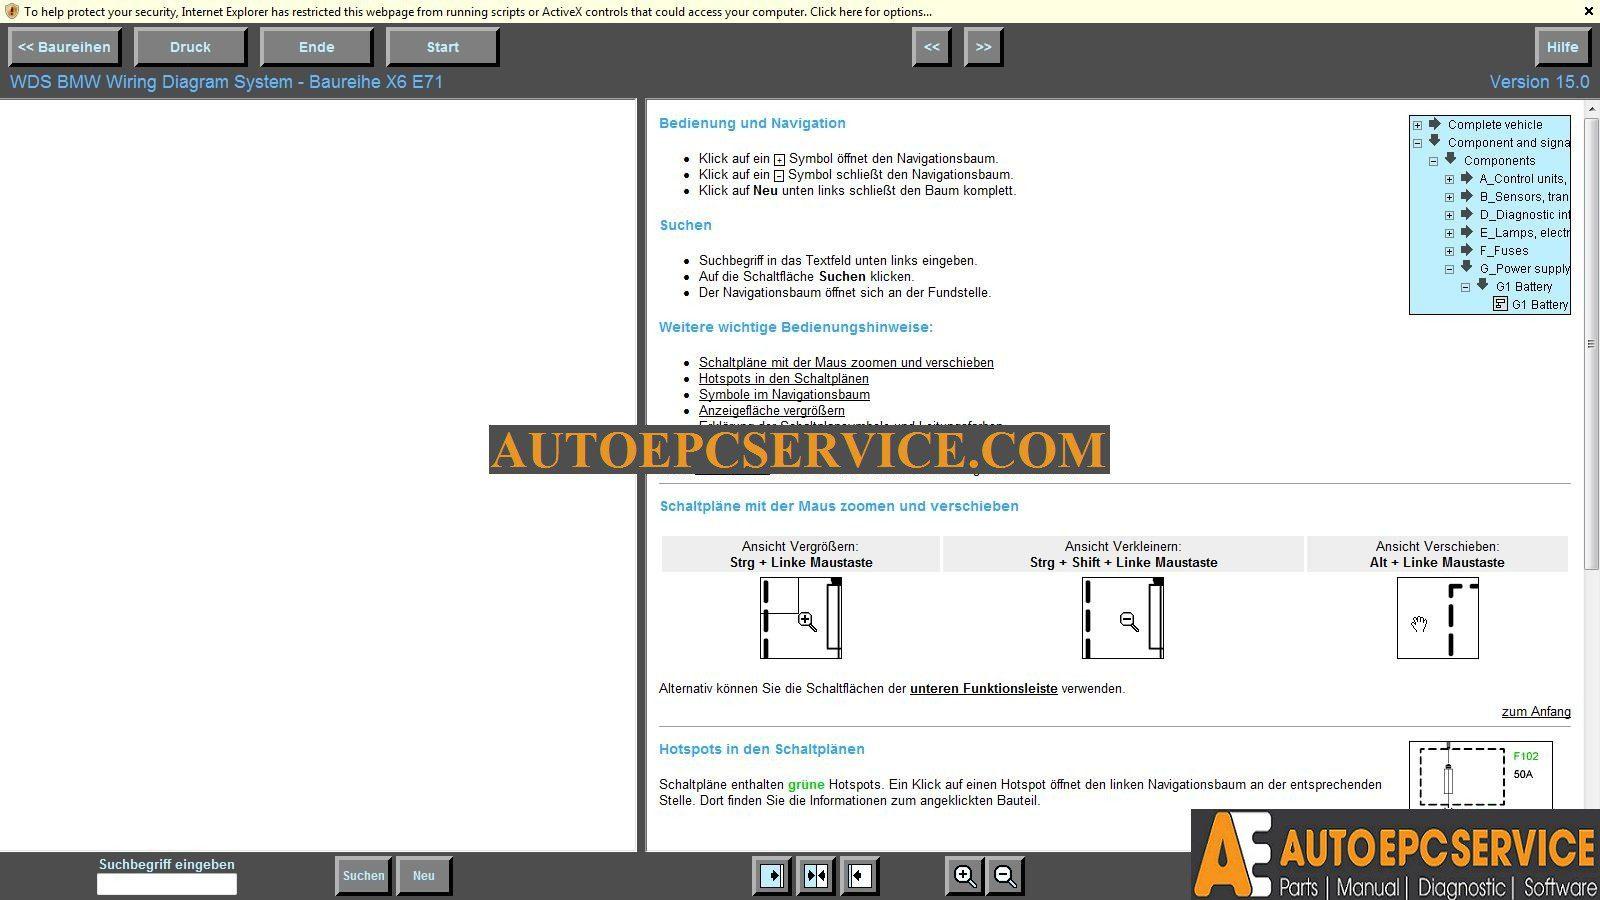 bmw wds v15 and mini wds v7 wiring diagram system \u2013 auto repair 1998 BMW 528I Parts Diagrams bmw wds v15 and mini wds v7 wiring diagram system \u2013 auto repair software auto epc software auto repair manual workshop manual service manual workshop manual